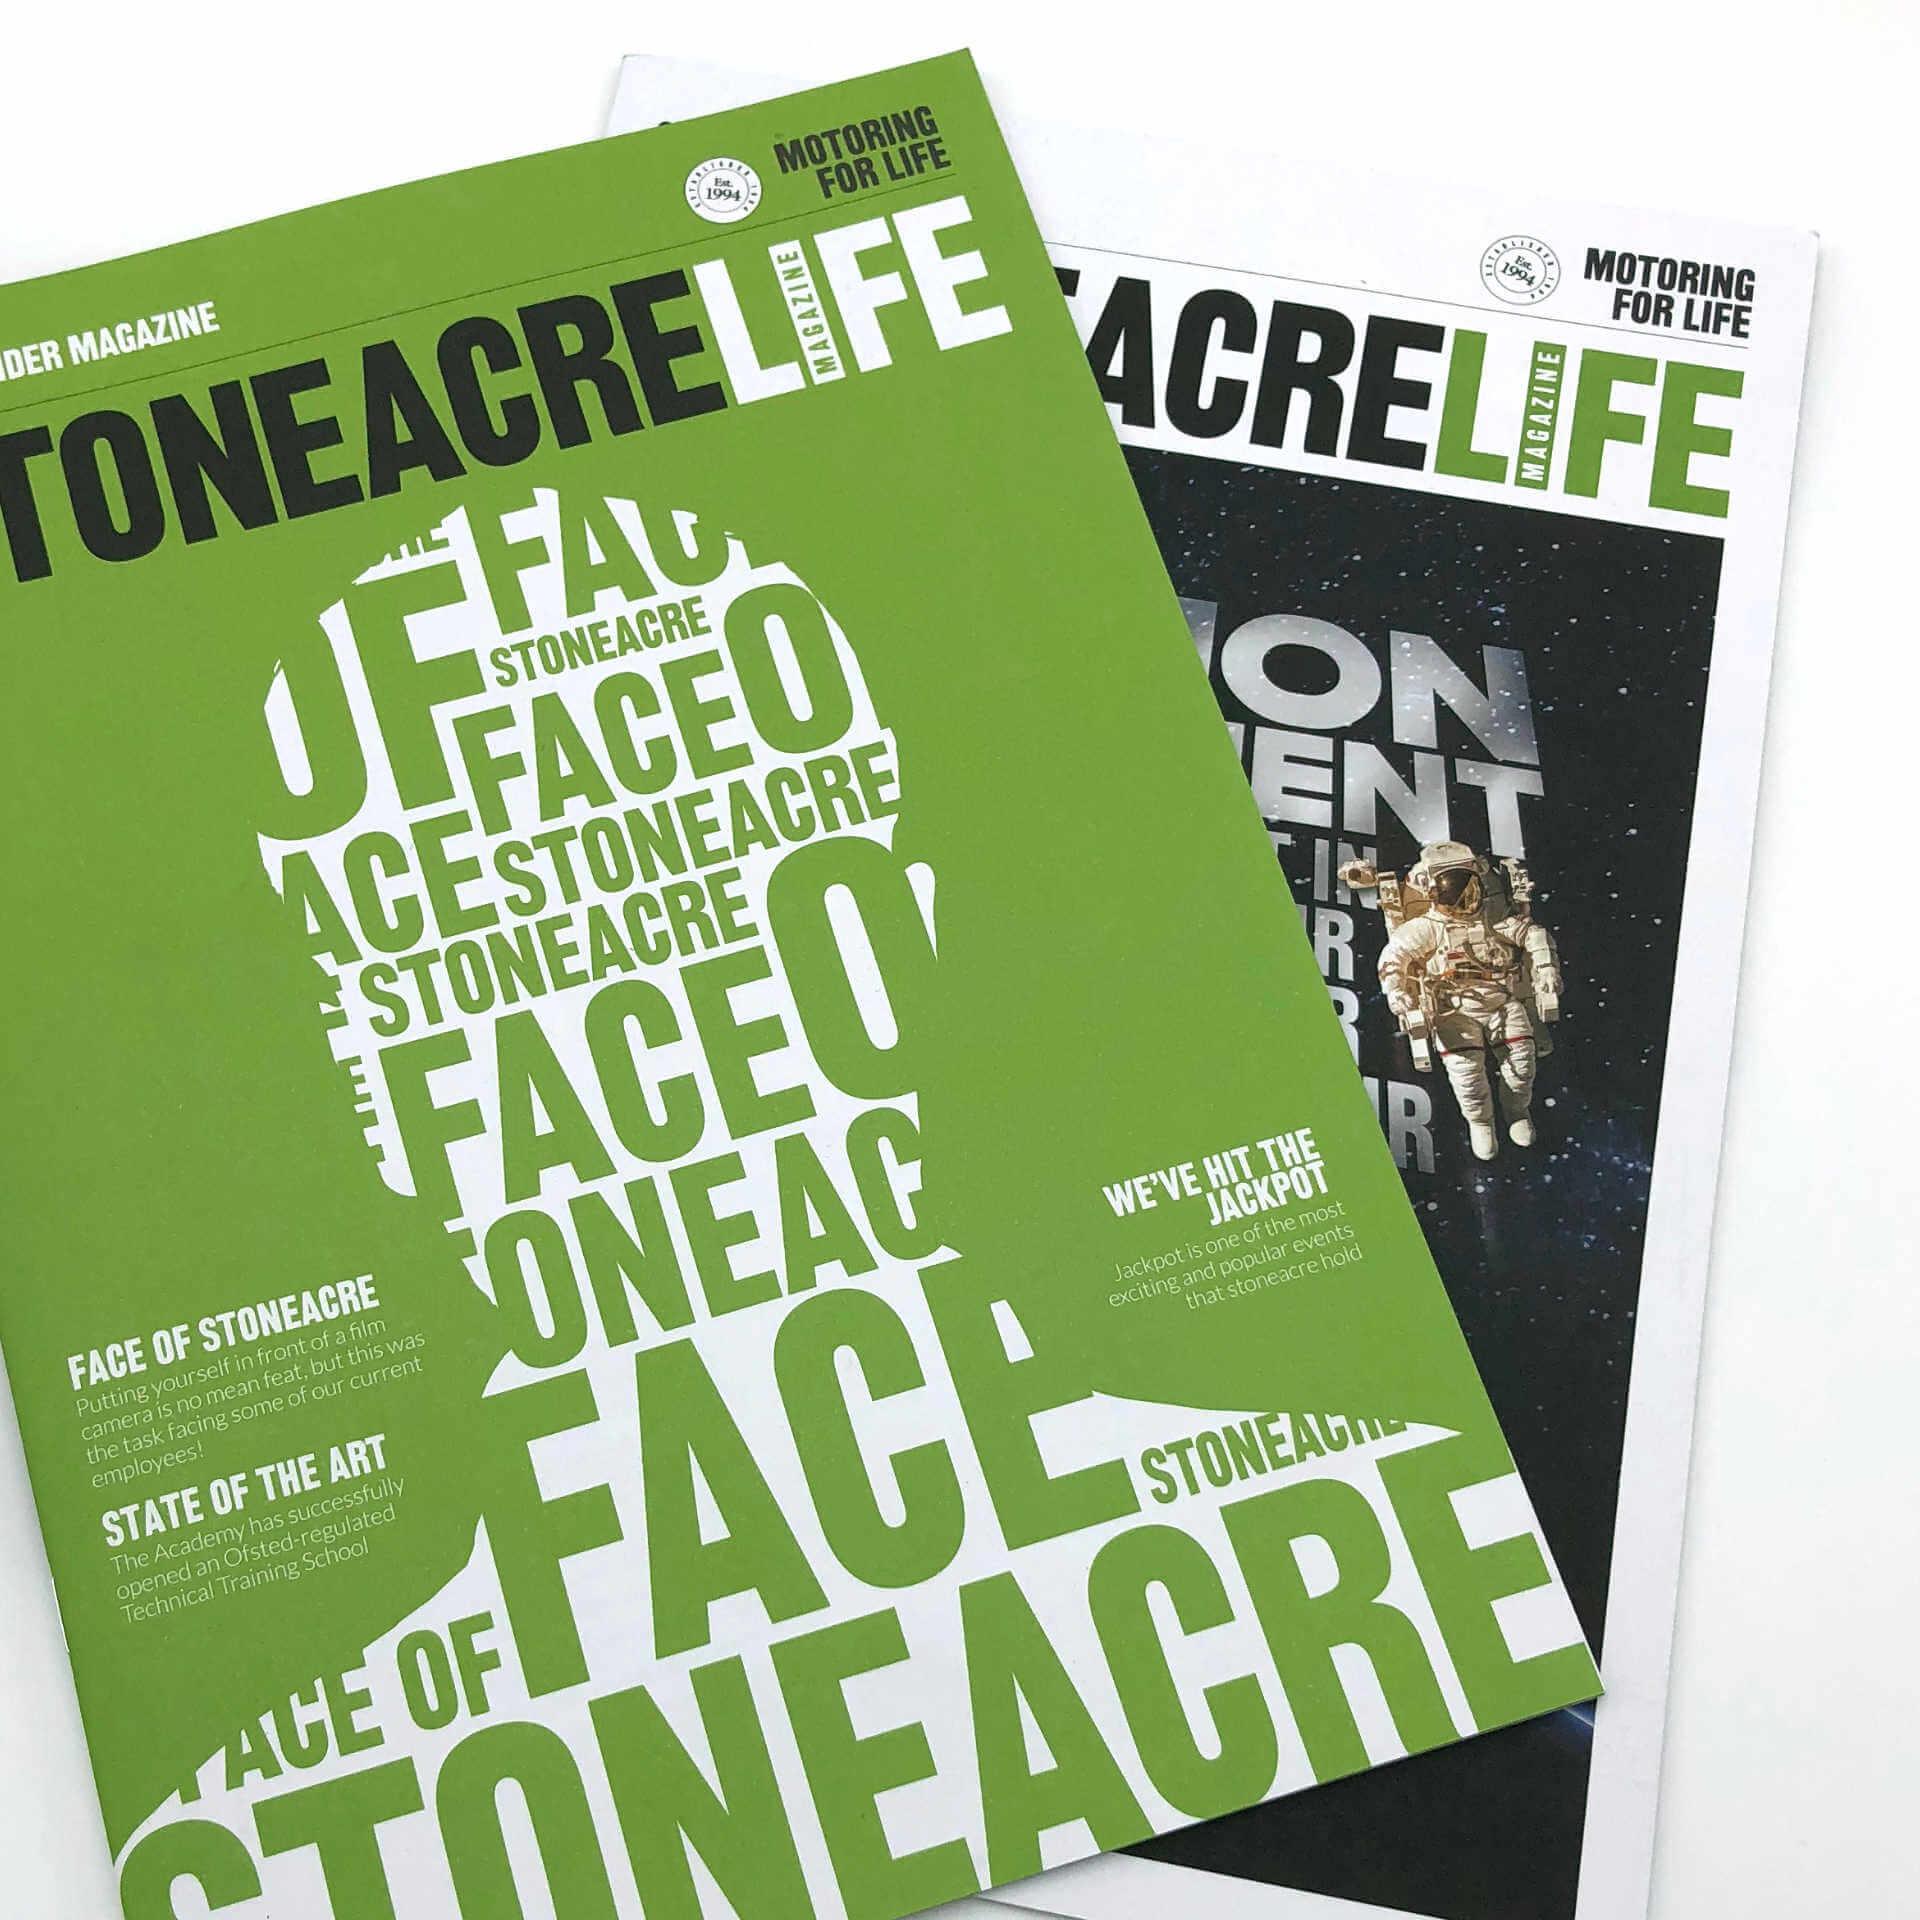 Stoneacre Life Magazine